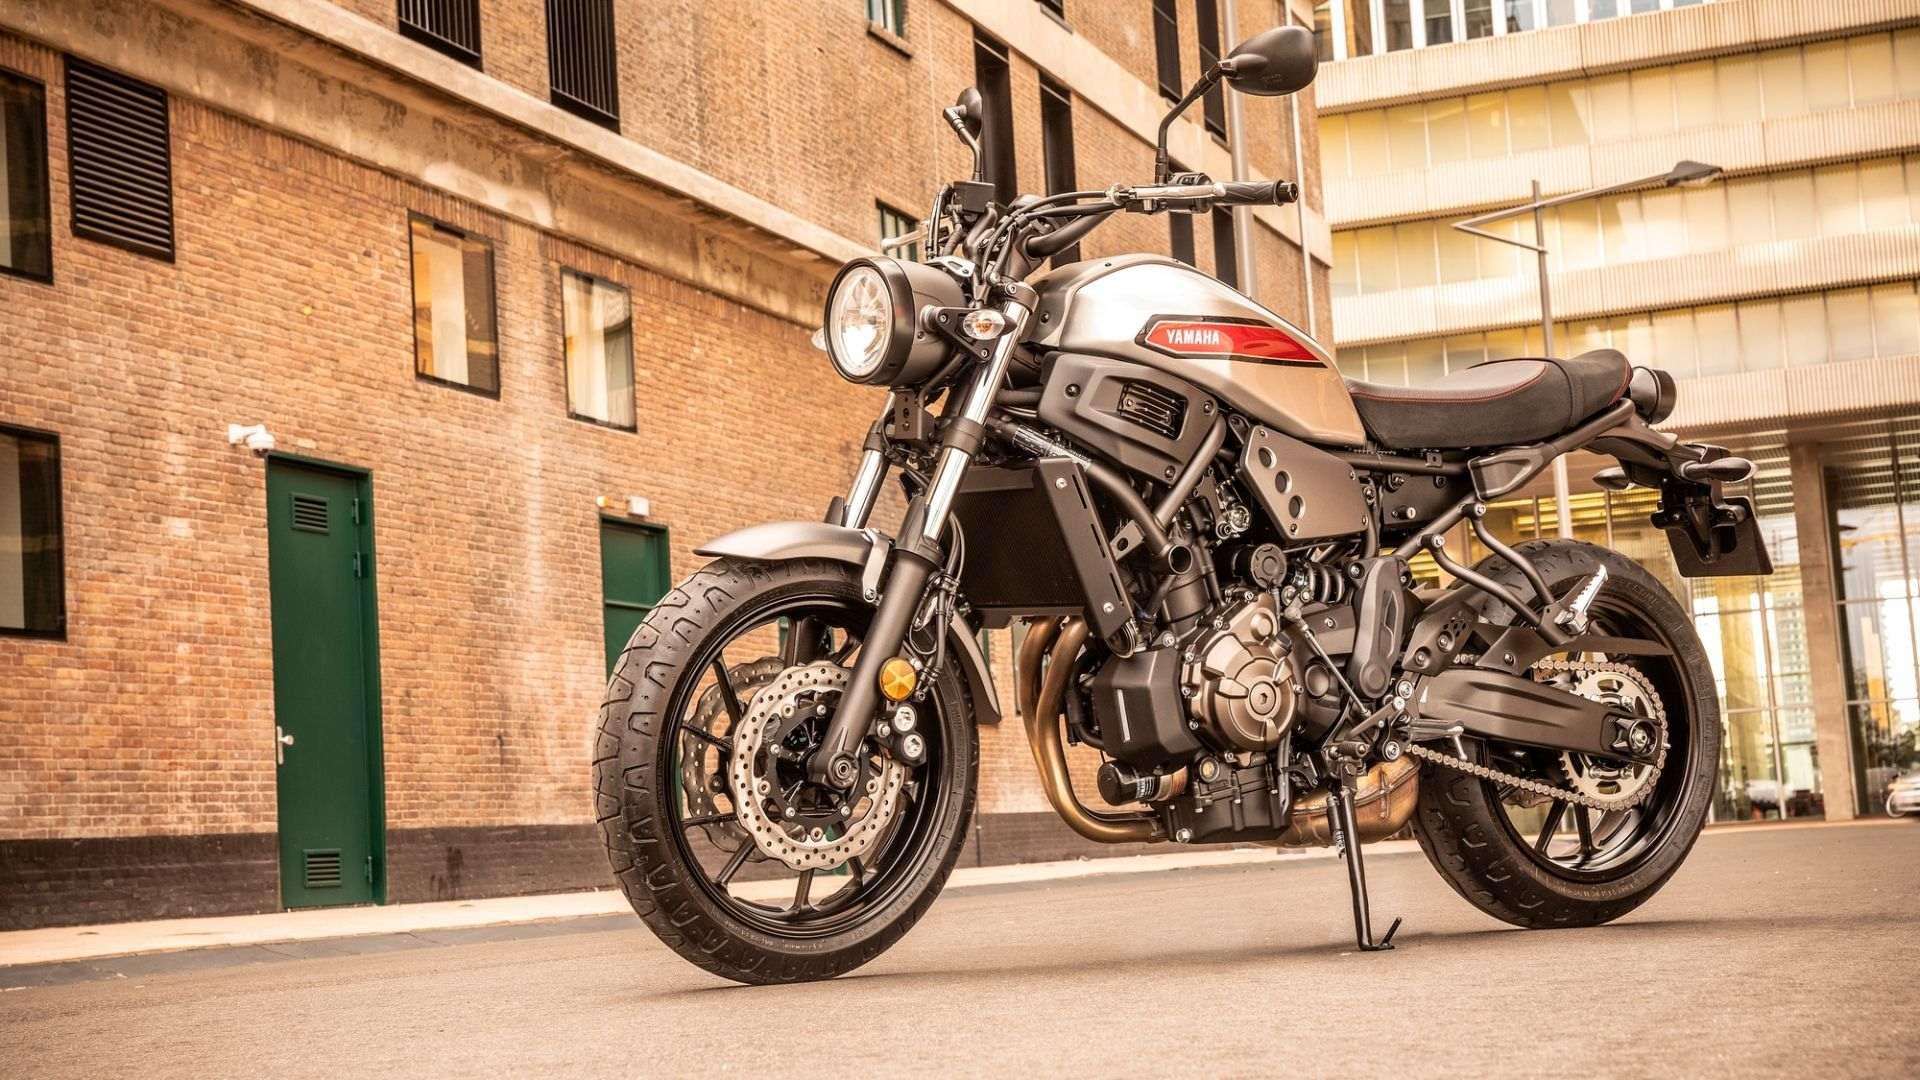 Moto del día: Yamaha XSR 700